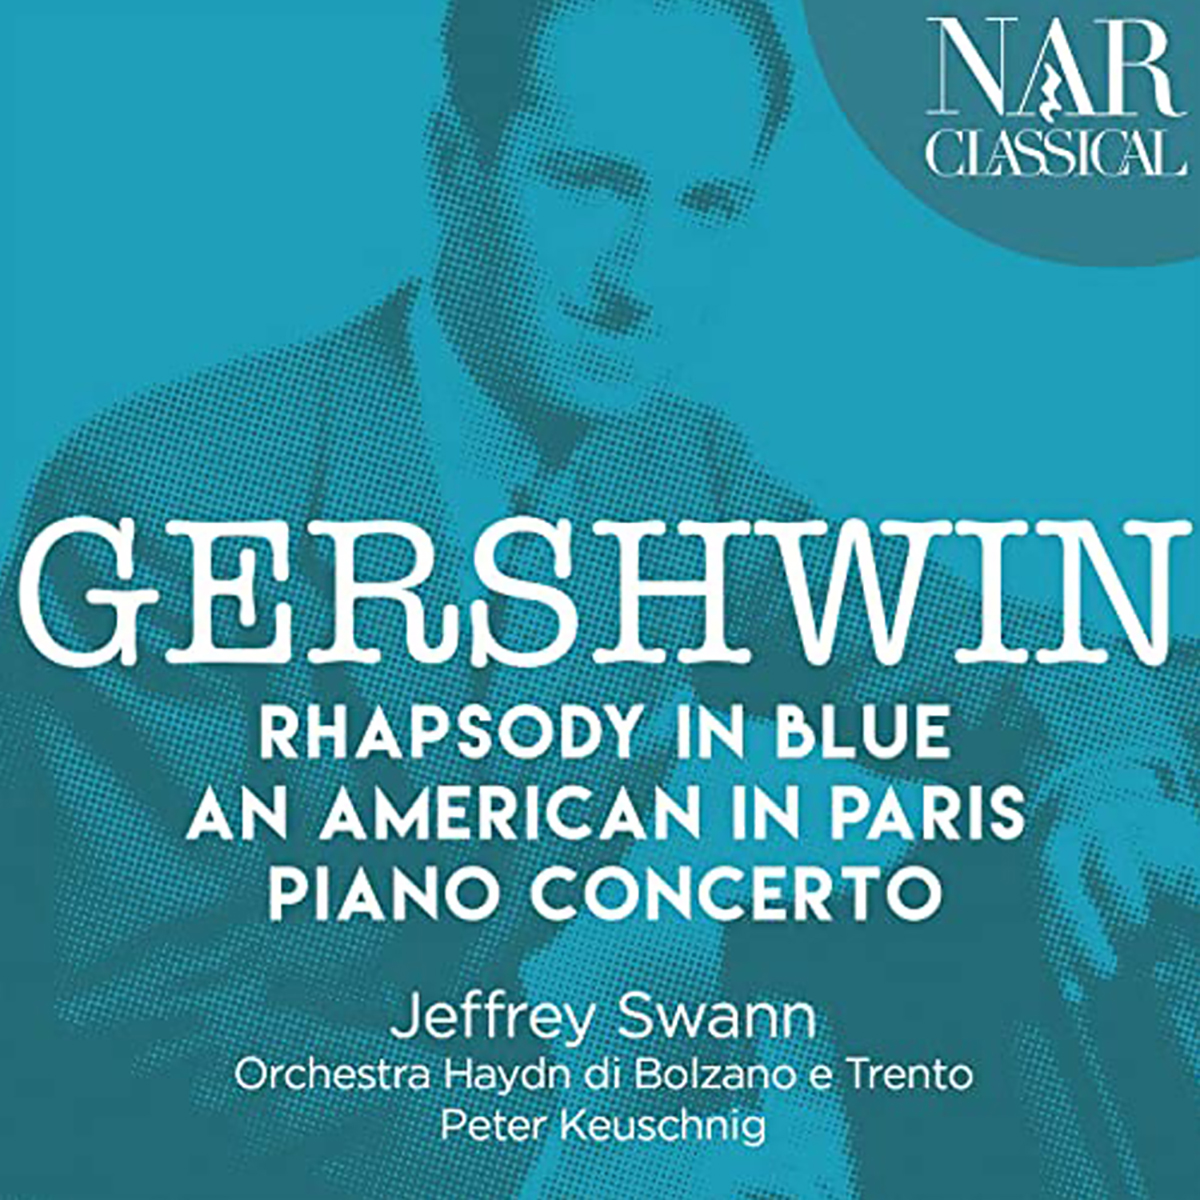 Gershwin - Rhapsody in Blue, An American in Paris Piano Concertos